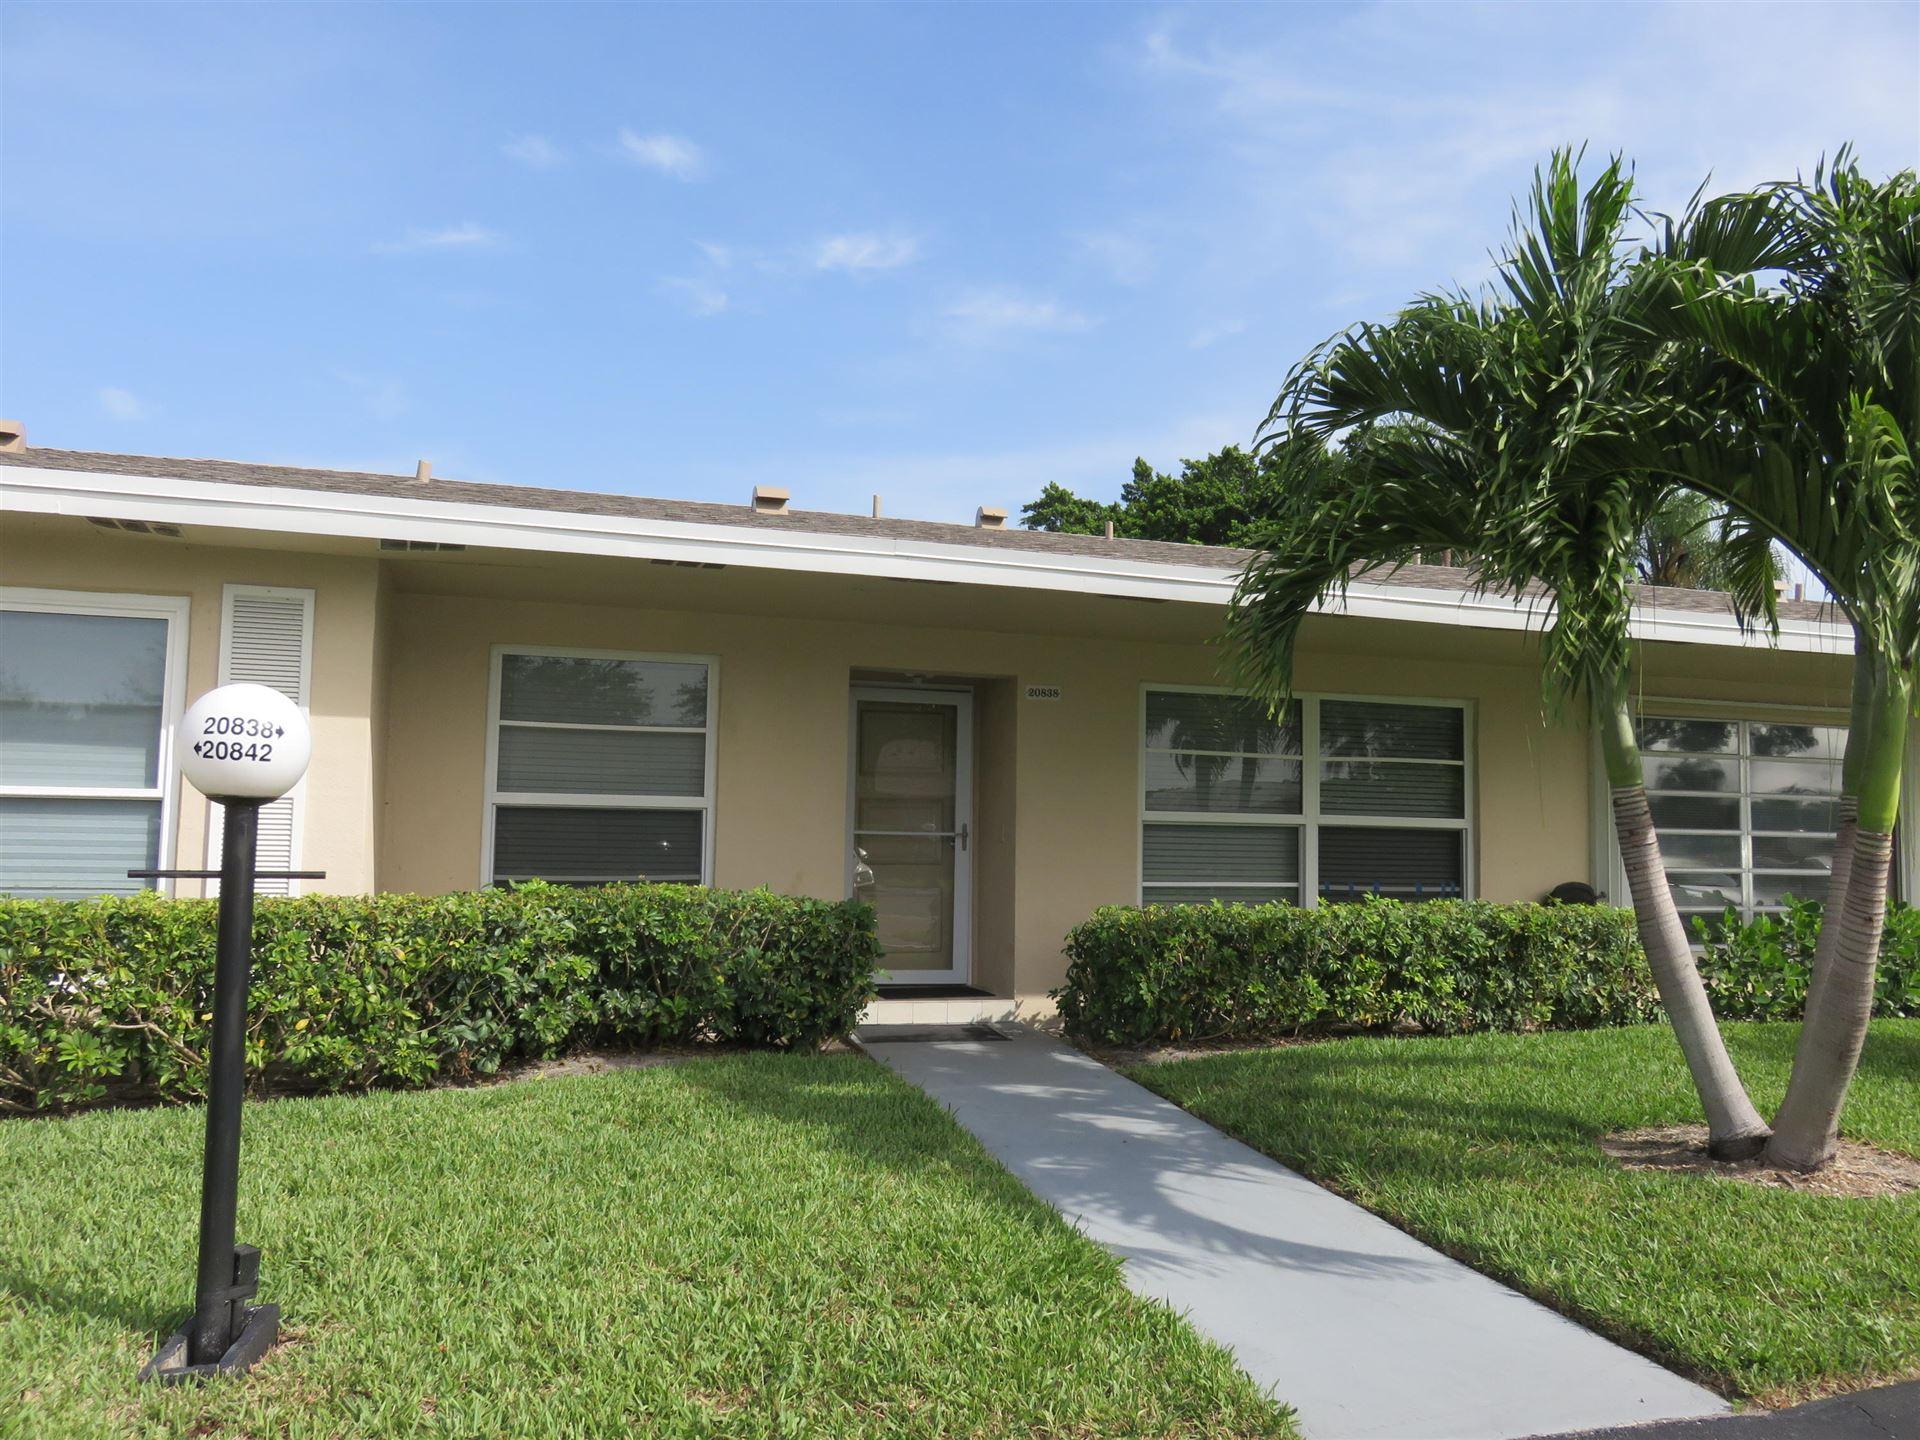 20838 Sedgewick Drive, Boca Raton, FL 33433 - #: RX-10638088